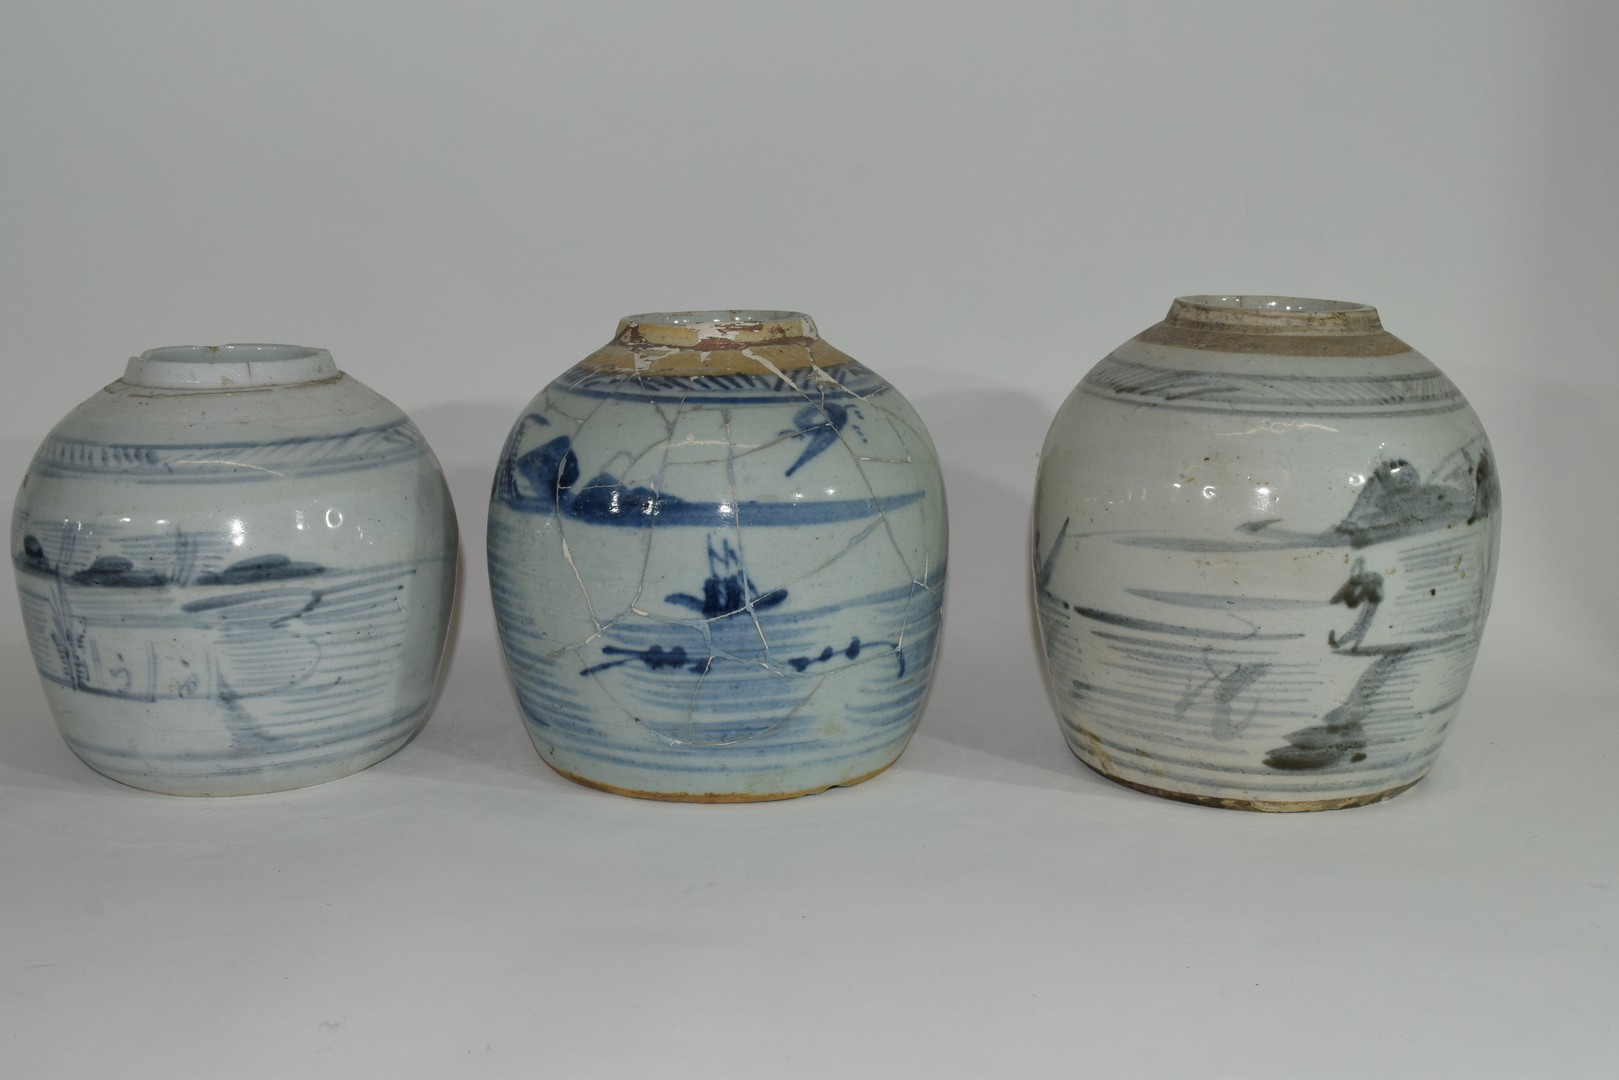 Group of three Provincial Oriental jars - Image 2 of 7